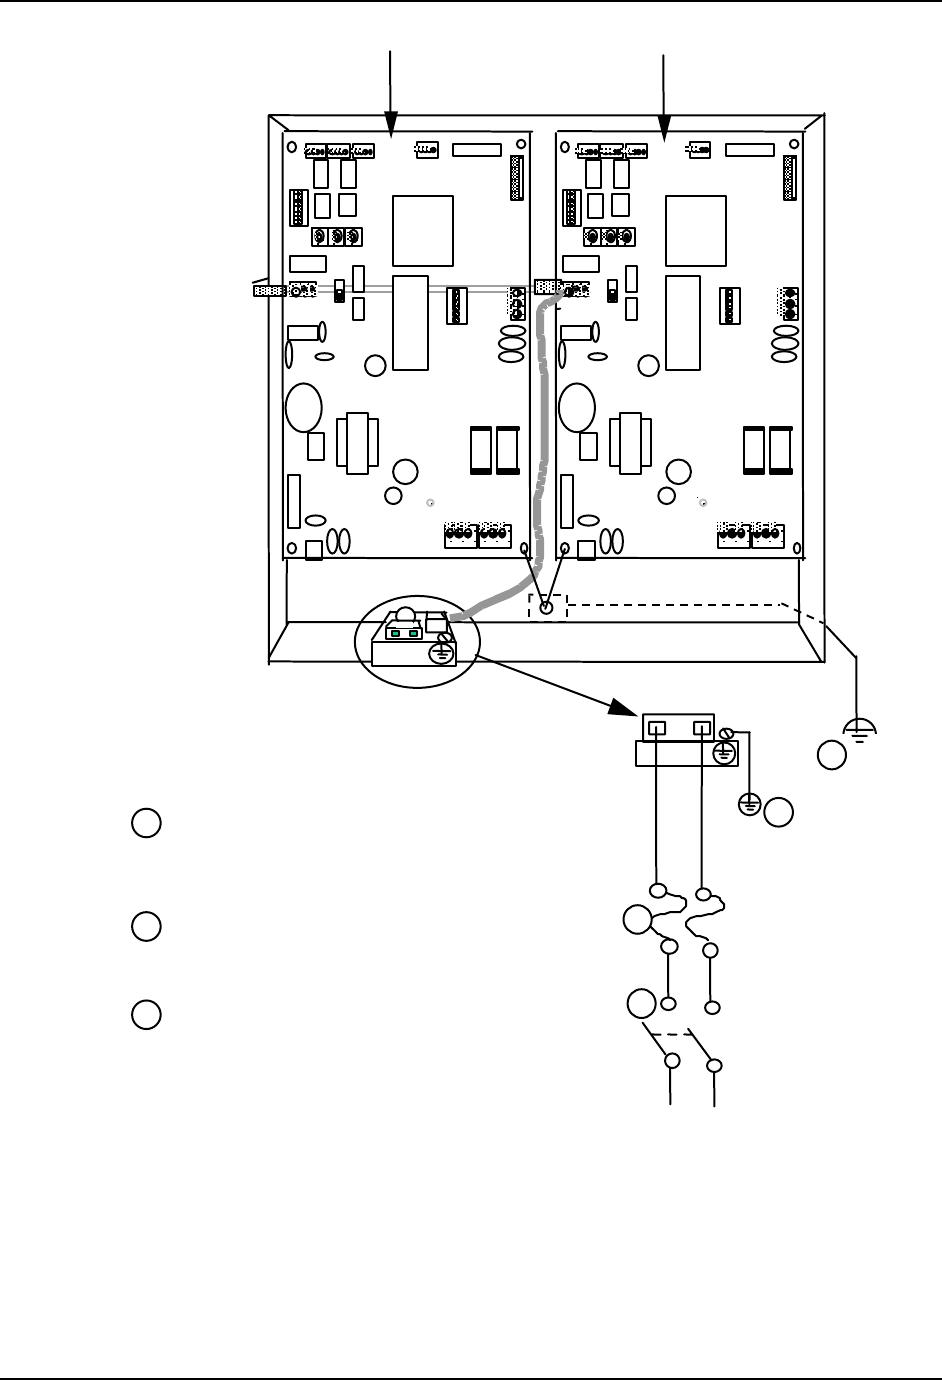 Honeywell Dvr Dr4300 Users Manual